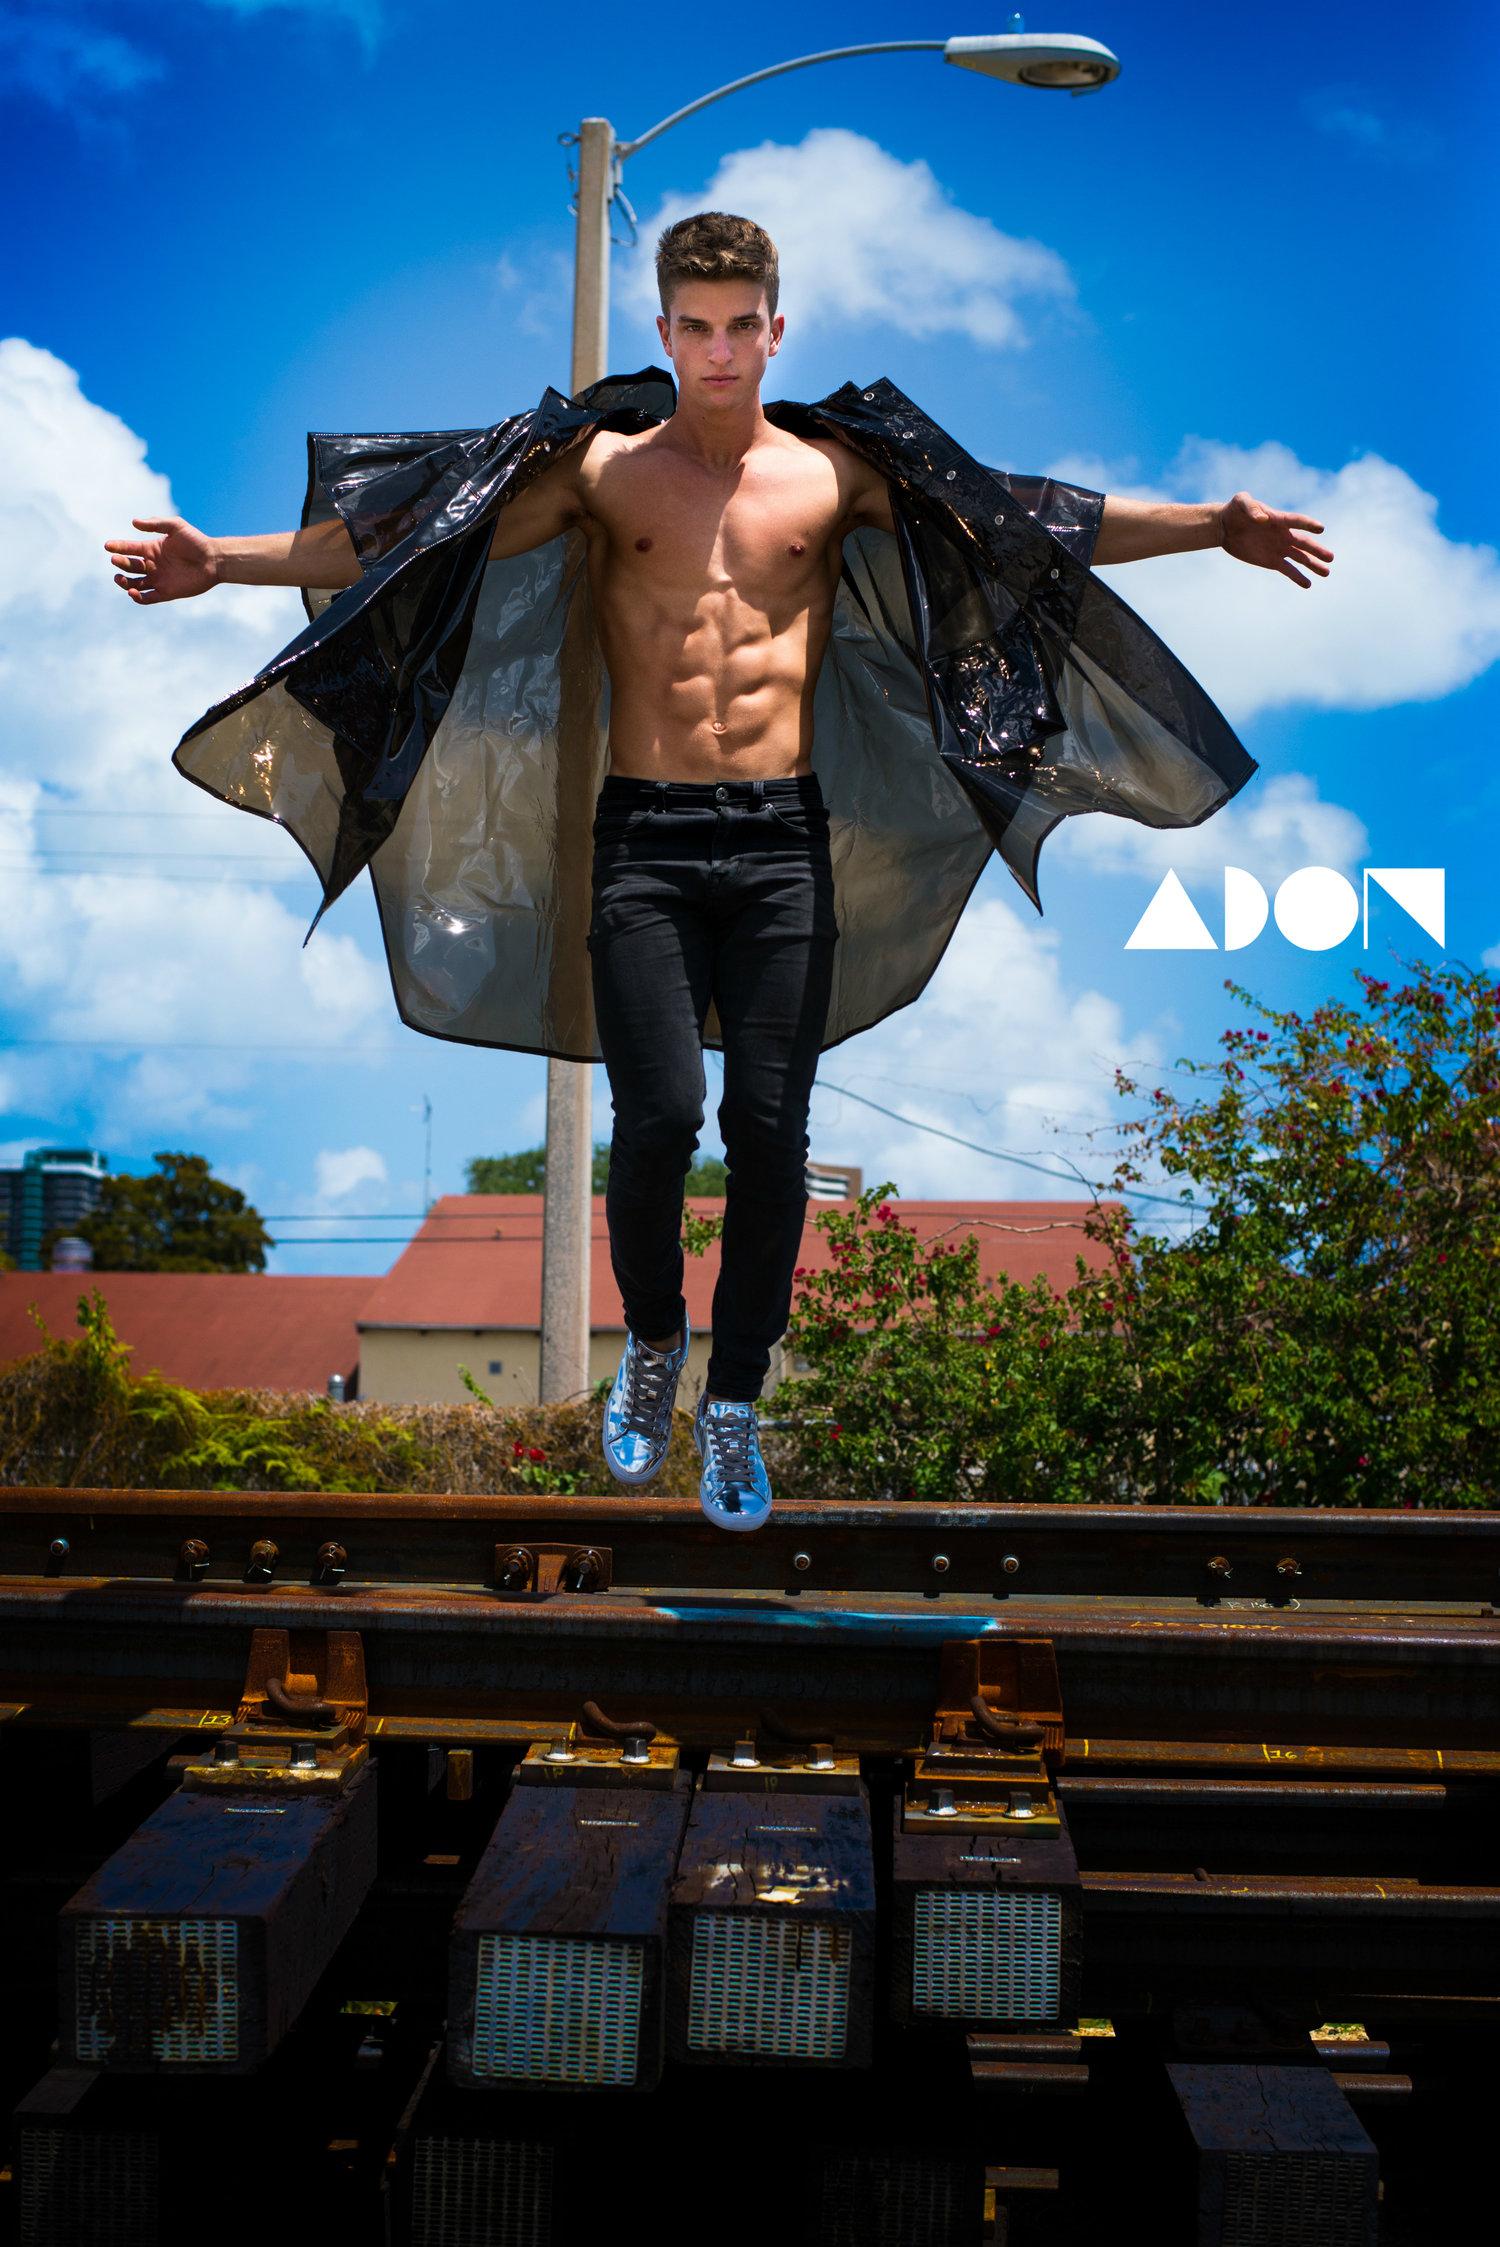 Adon Exclusive: Model Bruno Scafidi By Ivan Sanchez